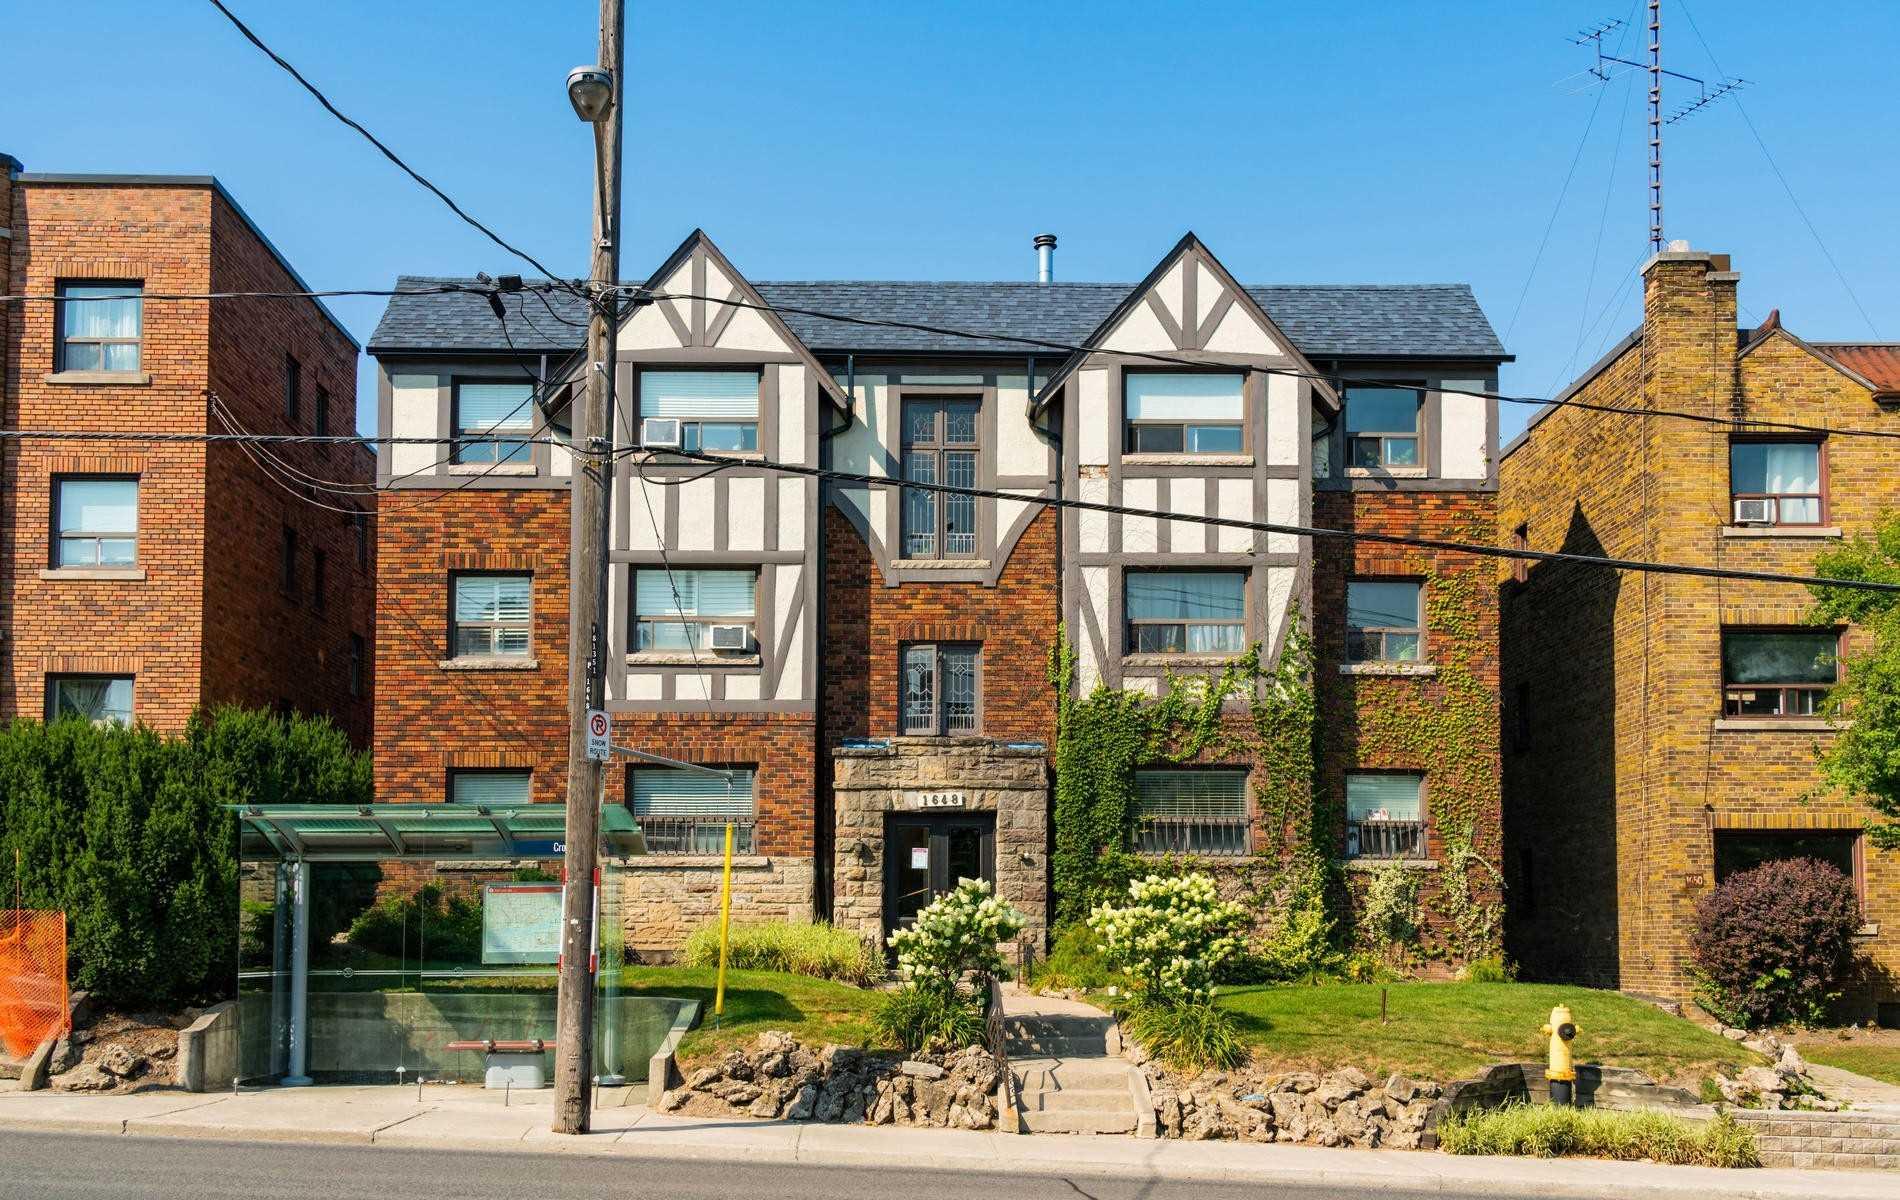 1648 Bathurst St, Toronto, Ontario M5P 3J7, 1 Bedroom Bedrooms, 4 Rooms Rooms,1 BathroomBathrooms,Co-op Apt,For Sale,Bathurst,C4884869